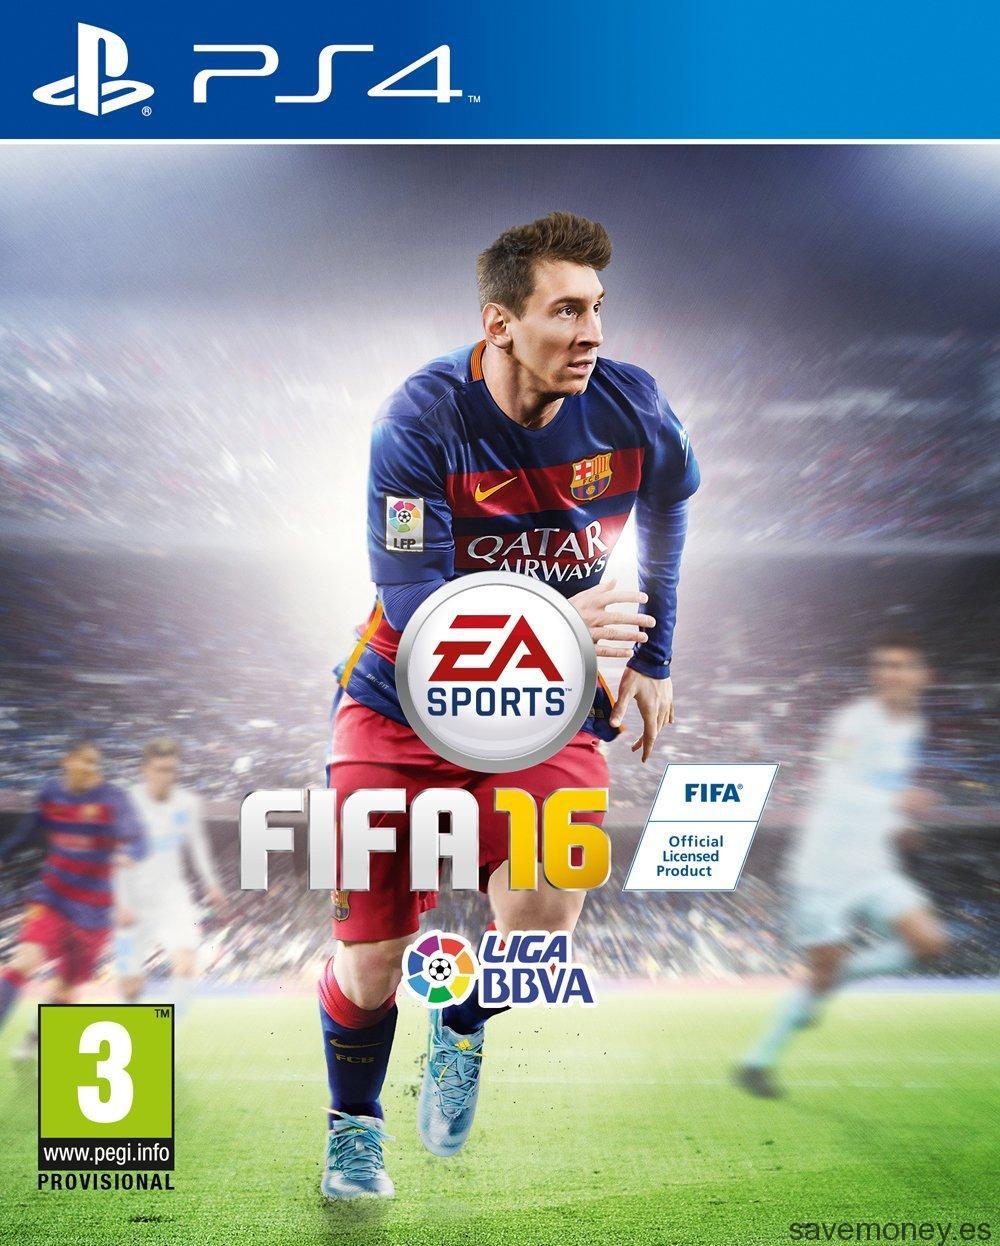 Comprar FIFA 16 en Preventa